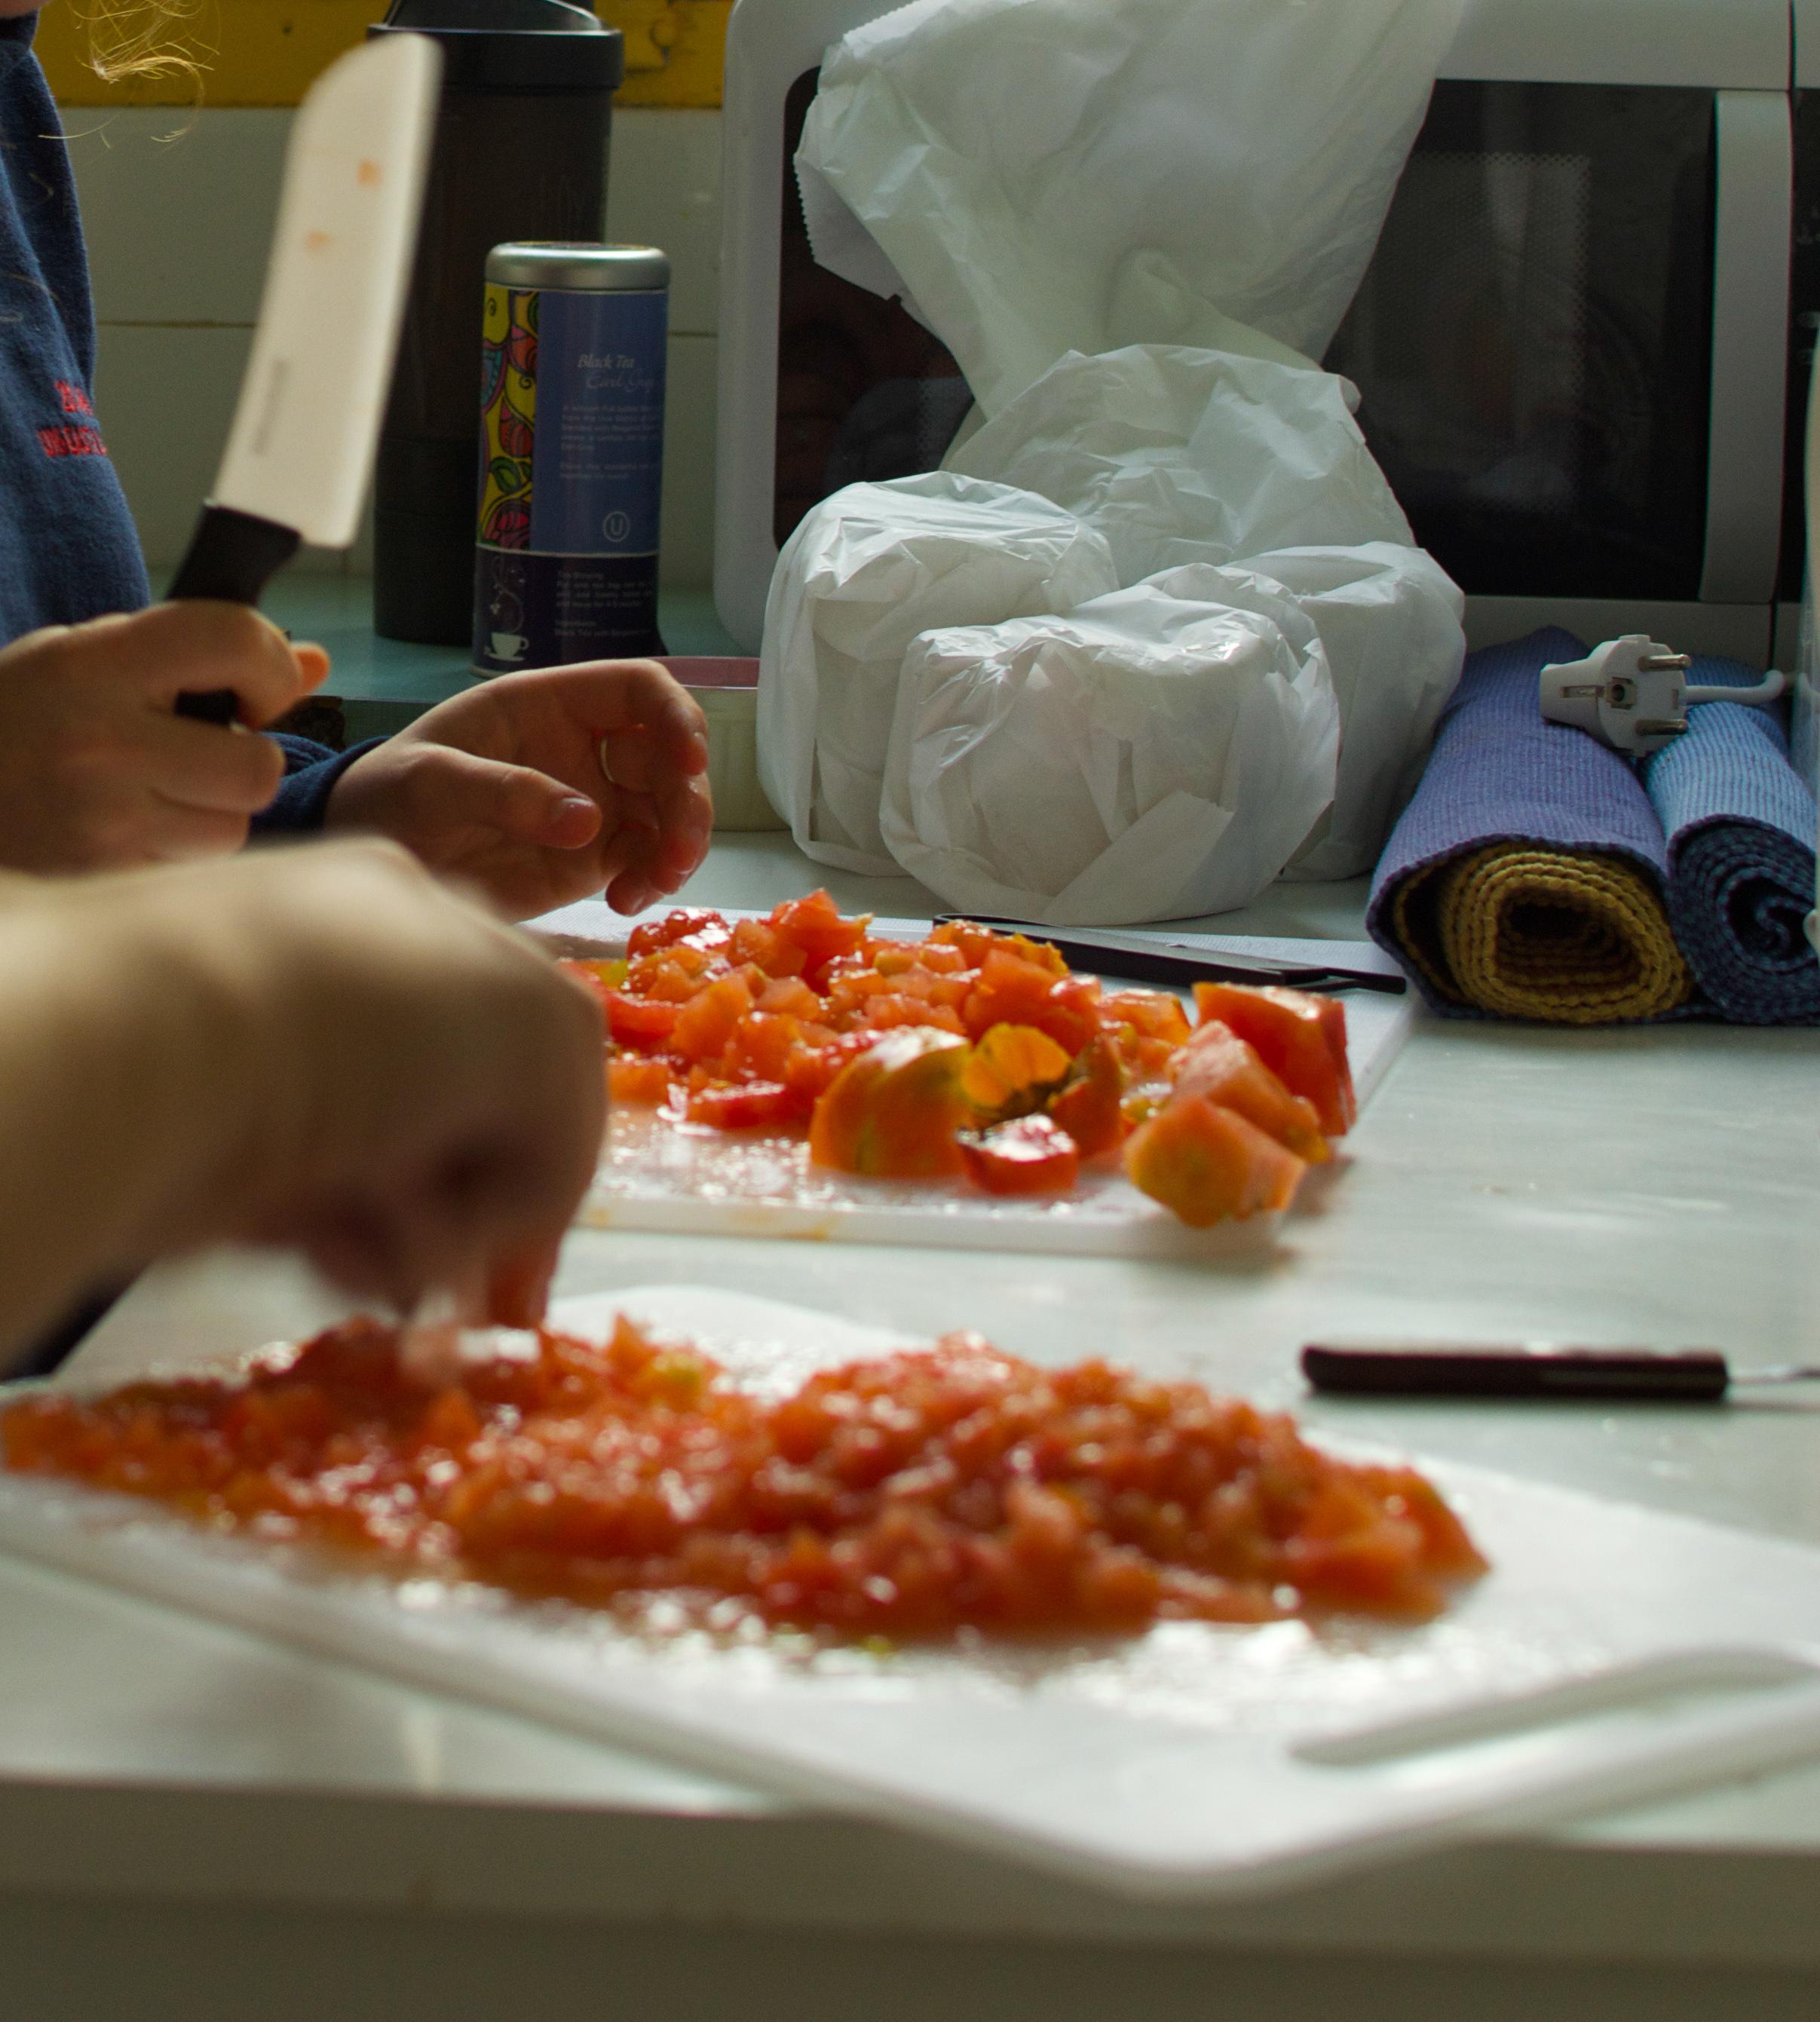 Proctor en Segovia experiential education cooking class